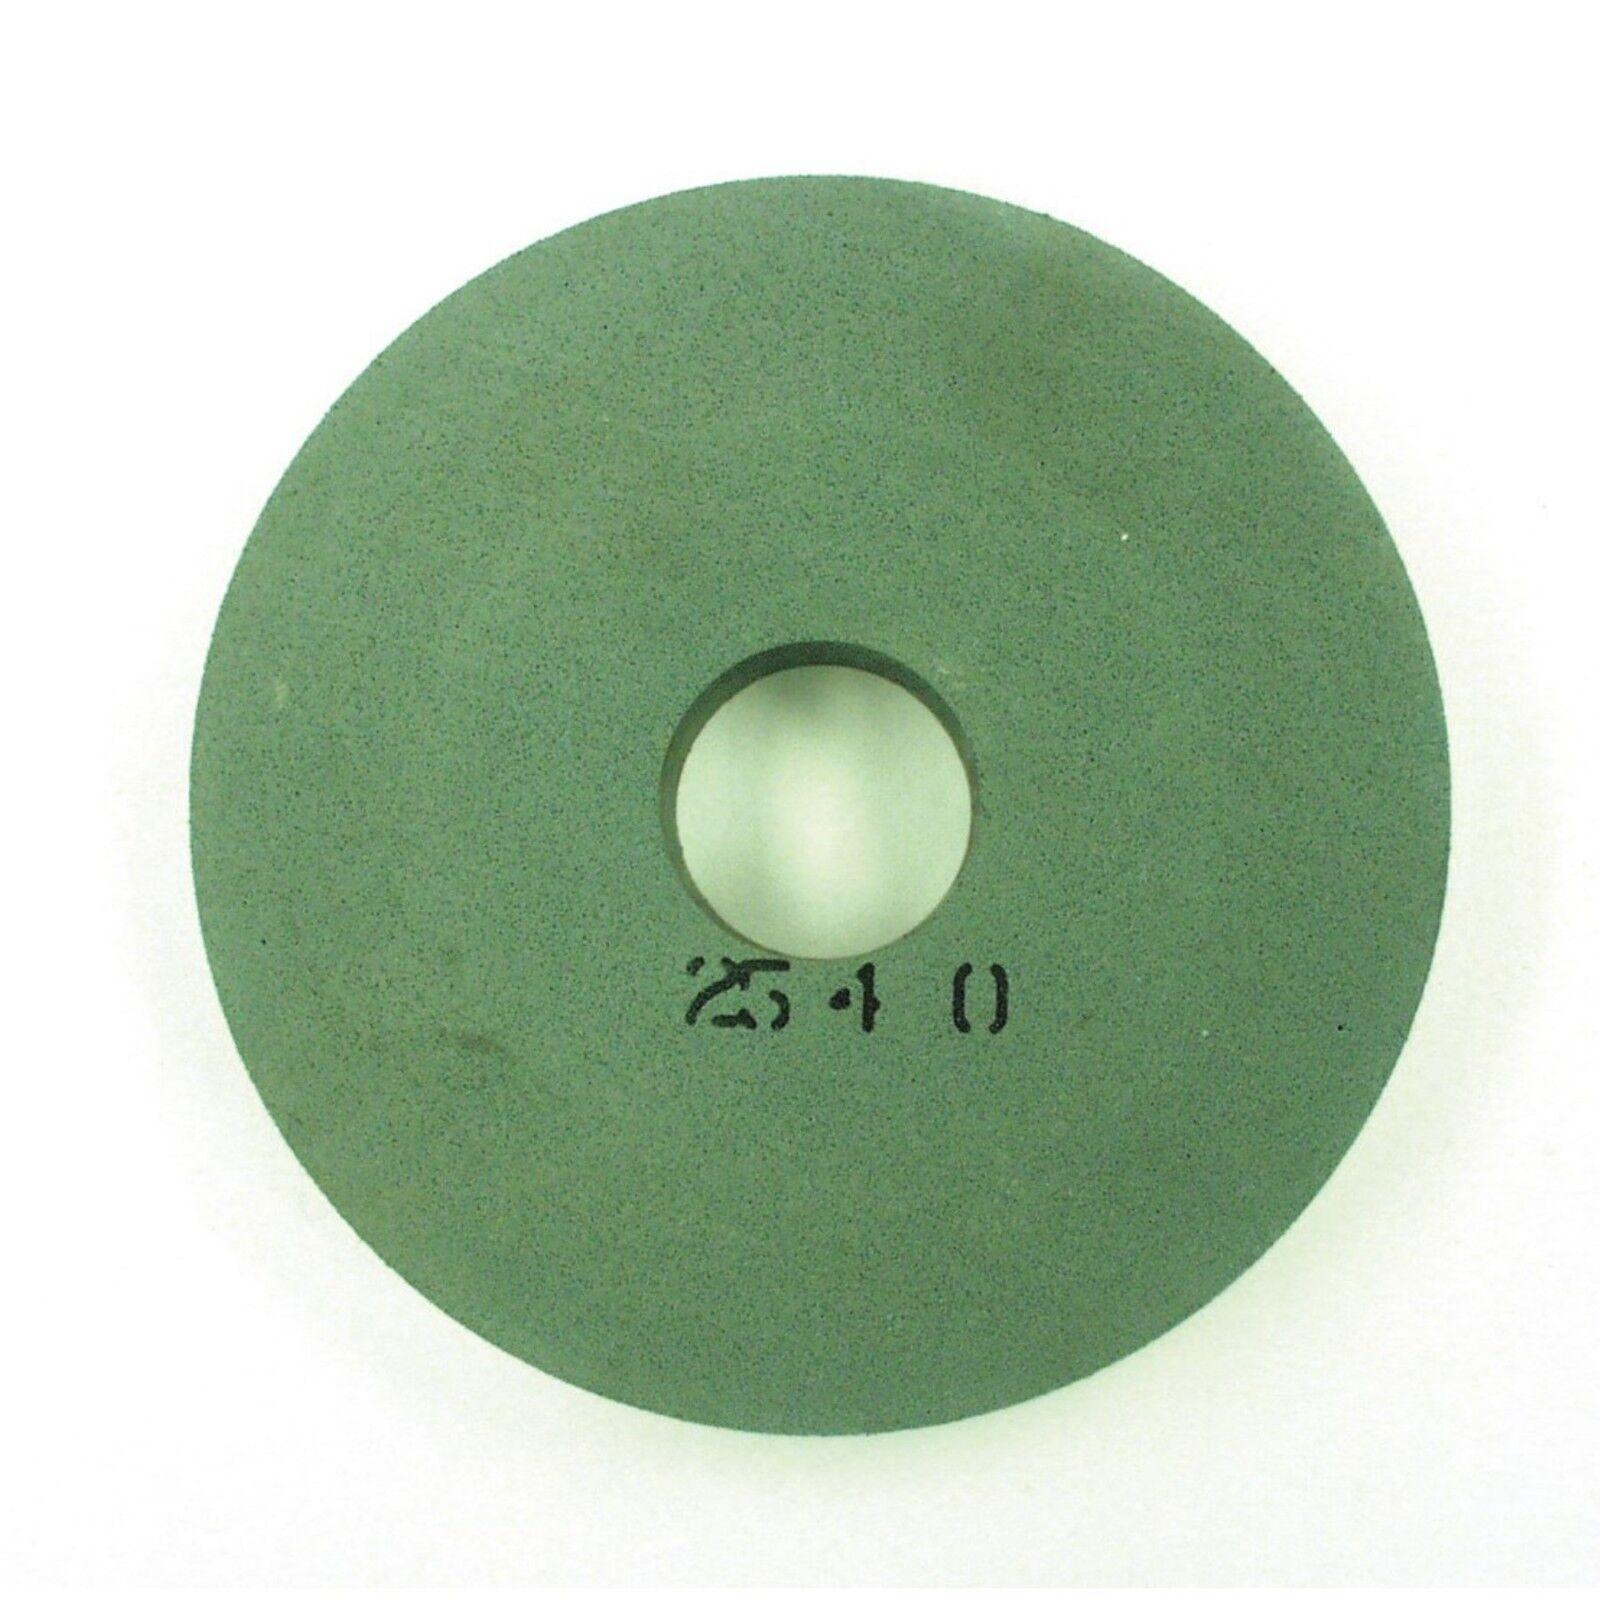 Abziehscheibe, Polierscheibe Tyrolit Elastic K800 175mm